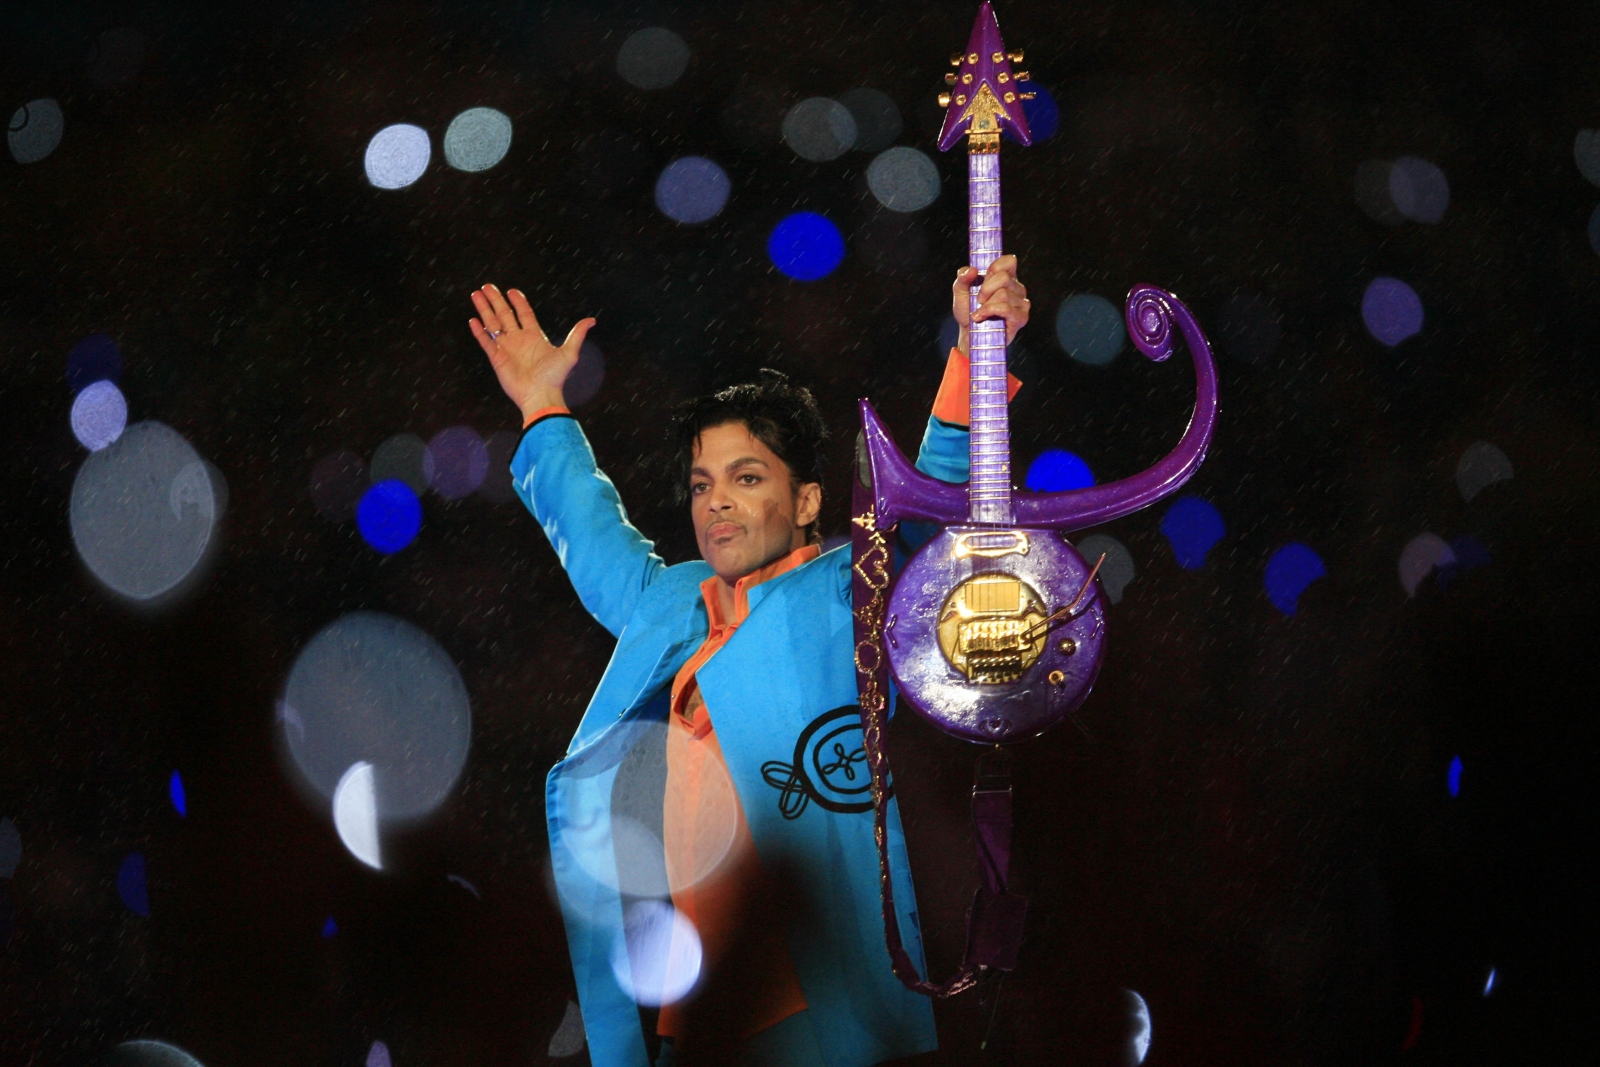 Prince's Superbowl performance 2007